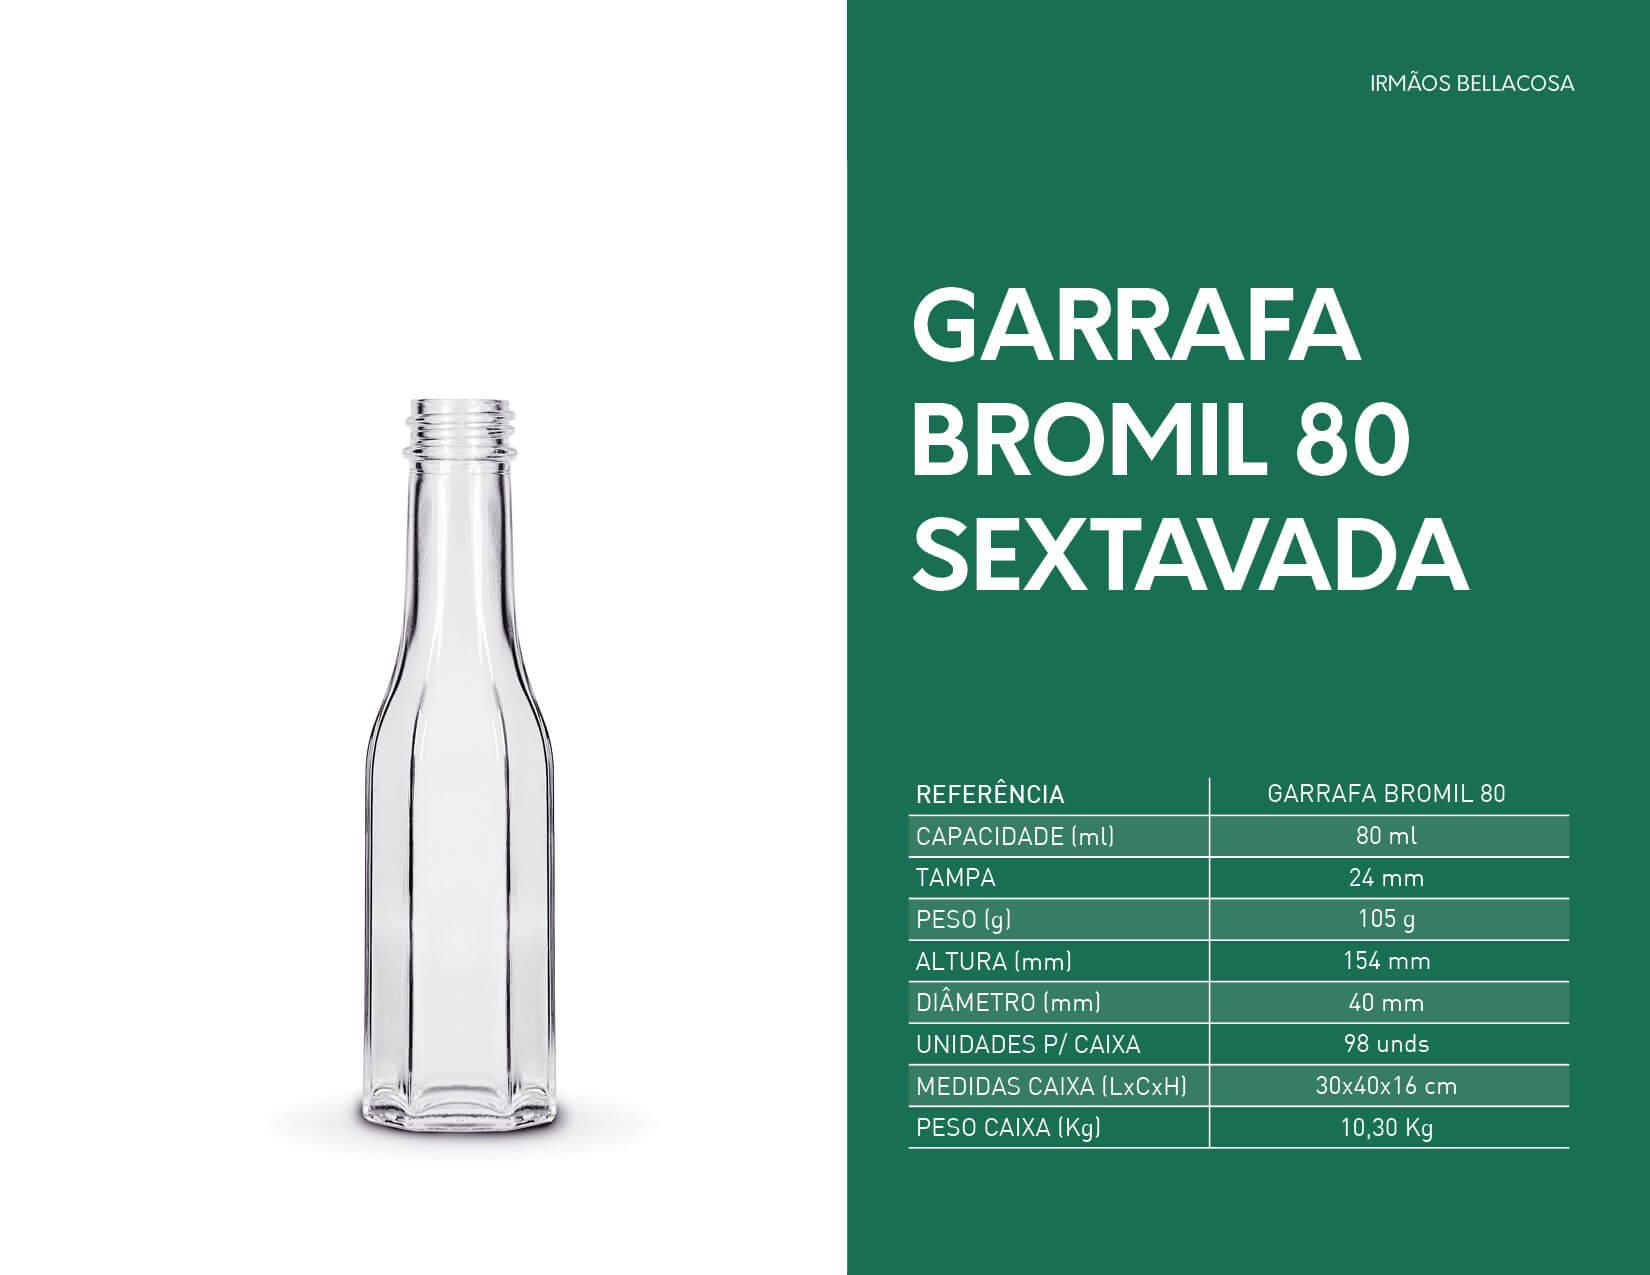 040-Garrafa-bromil-80-sextavada-irmaos-bellacosa-embalagens-de-vidro